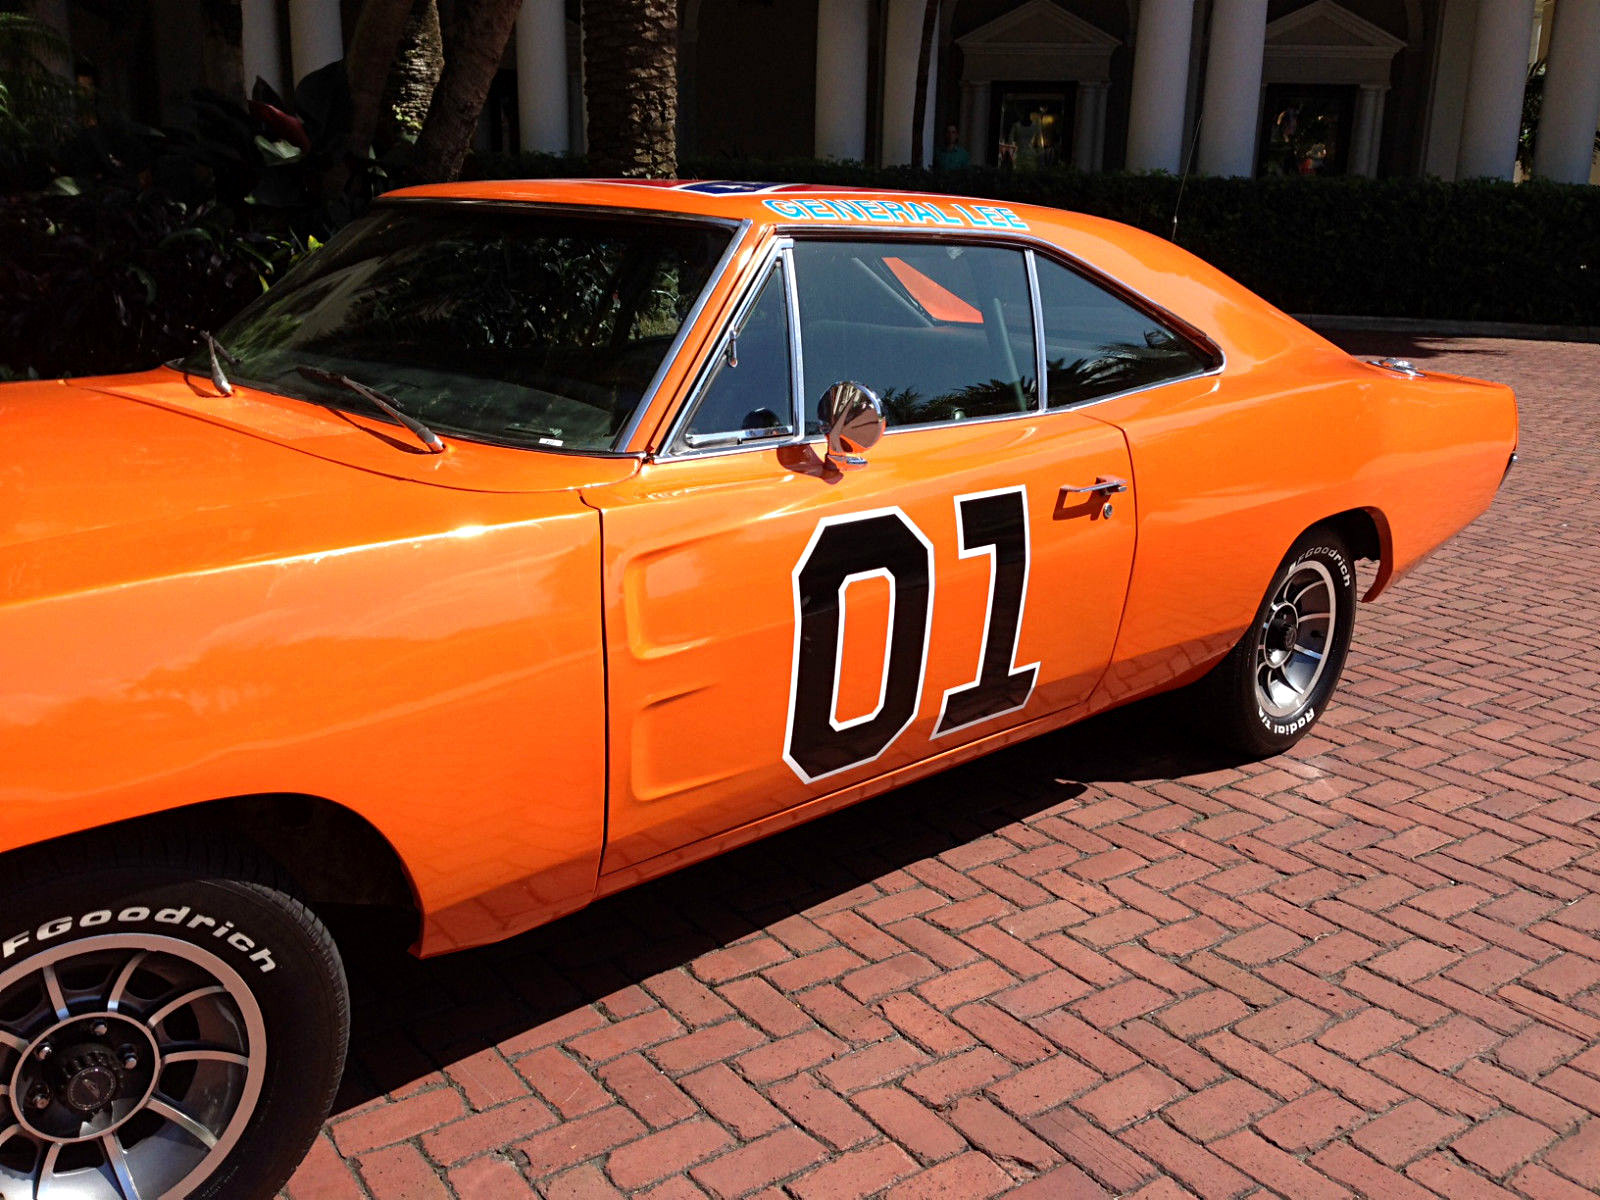 1969-Dodge-Charger-General-Lee-Movie-car-1745435